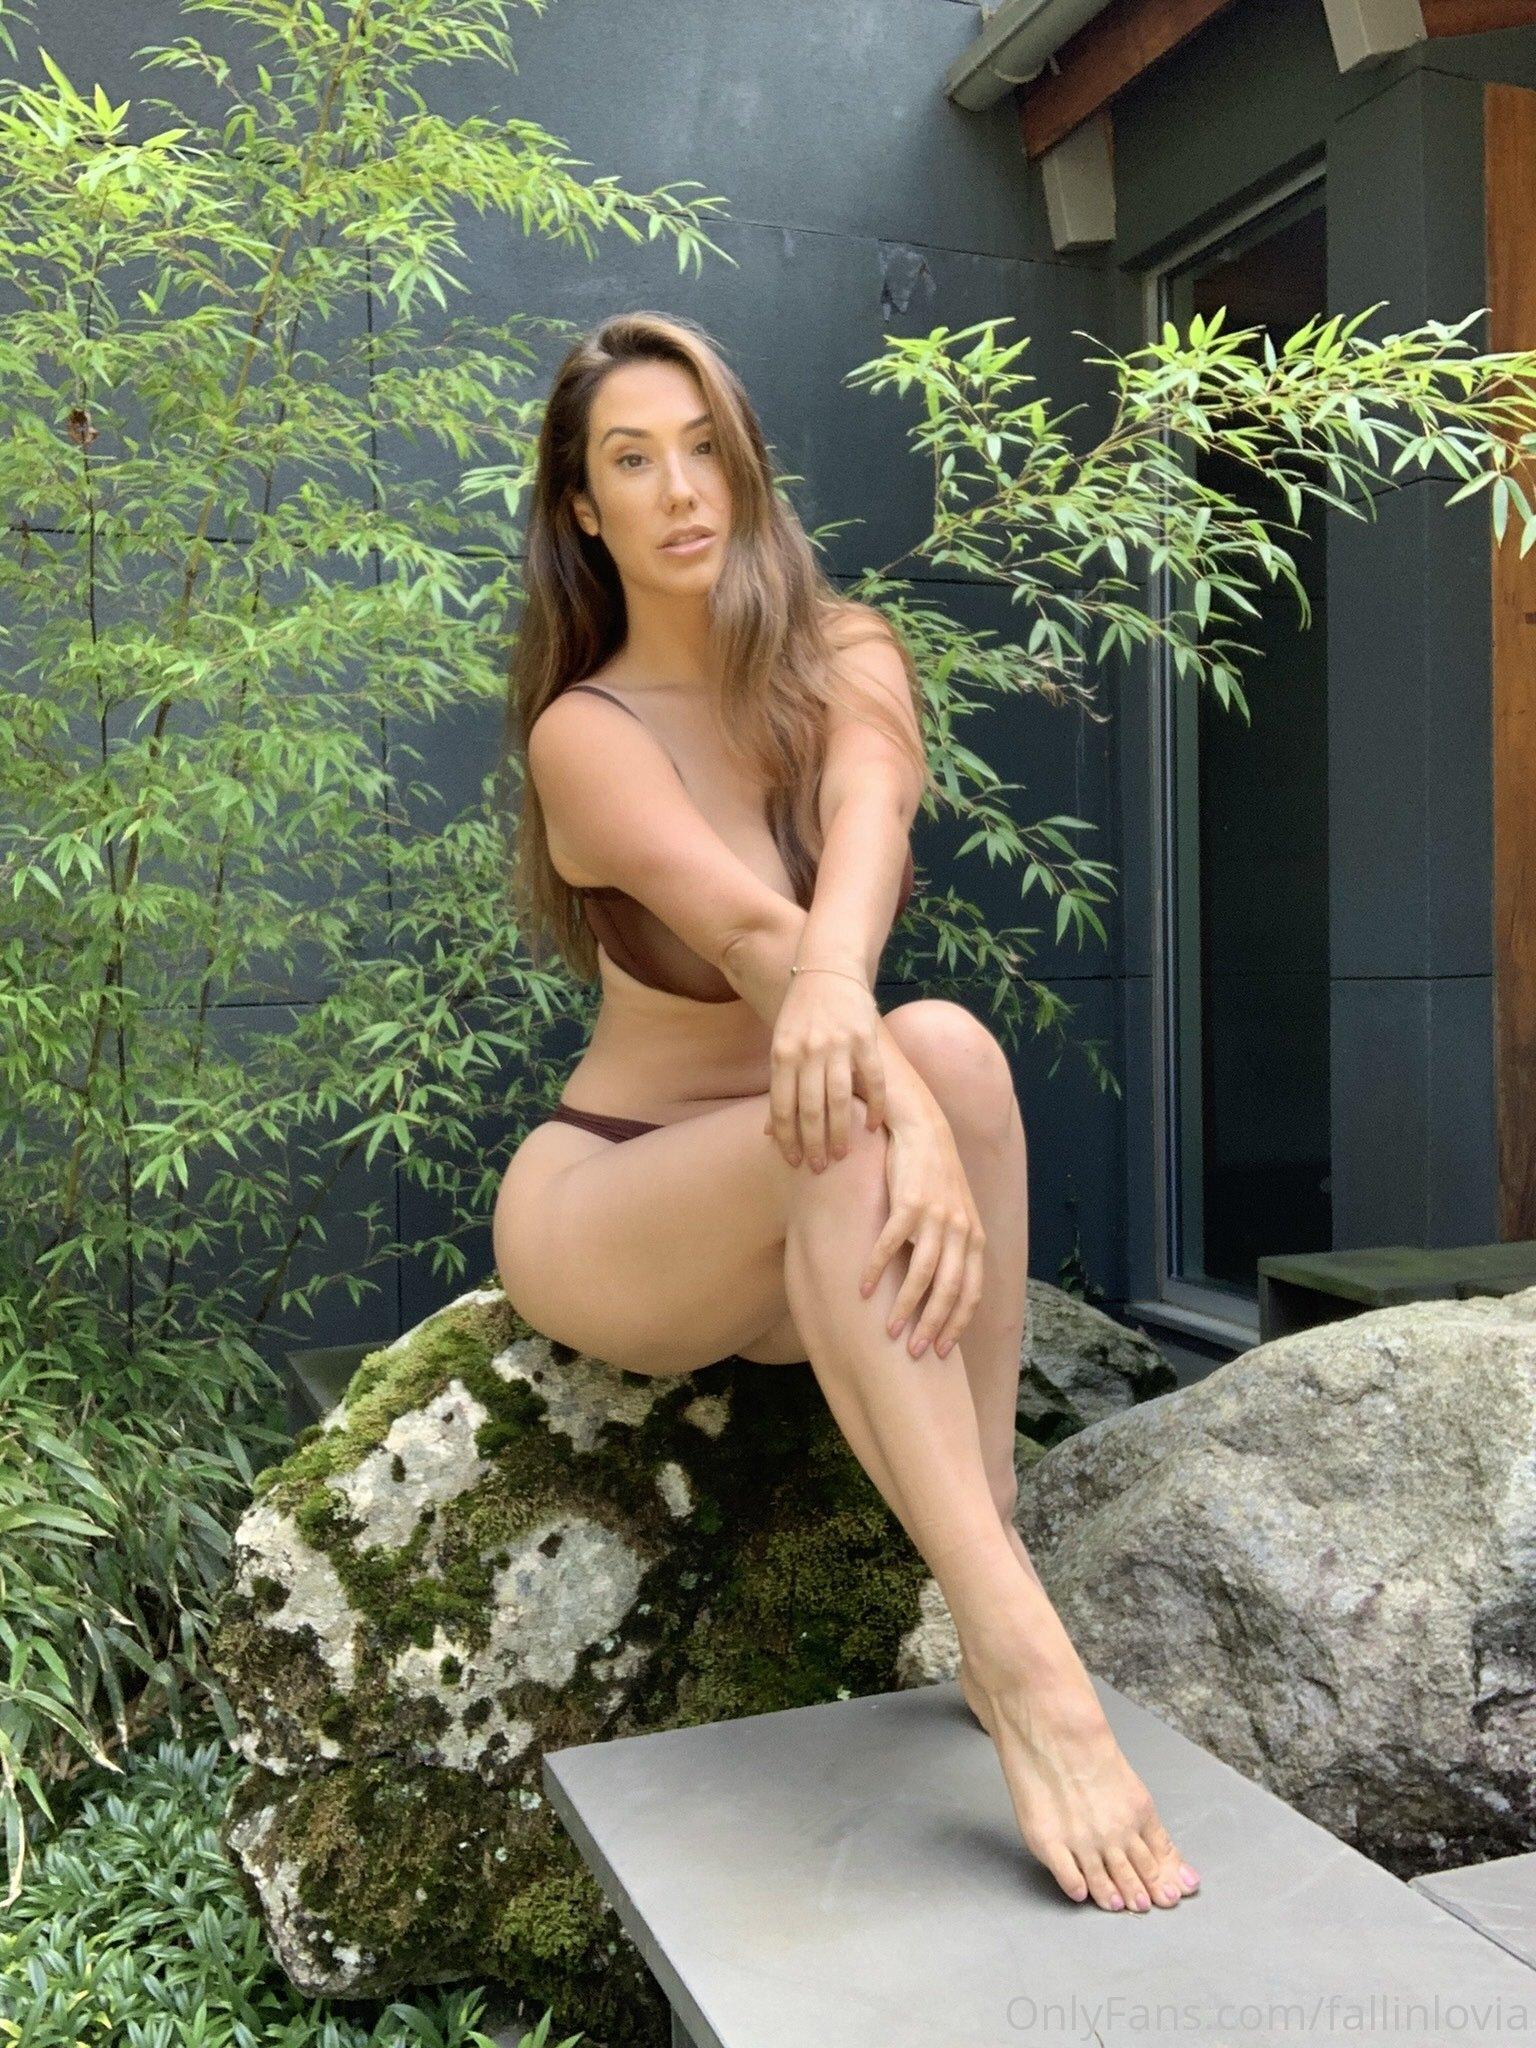 Eva Lovia, Fallinlovia, Onlyfans 0267